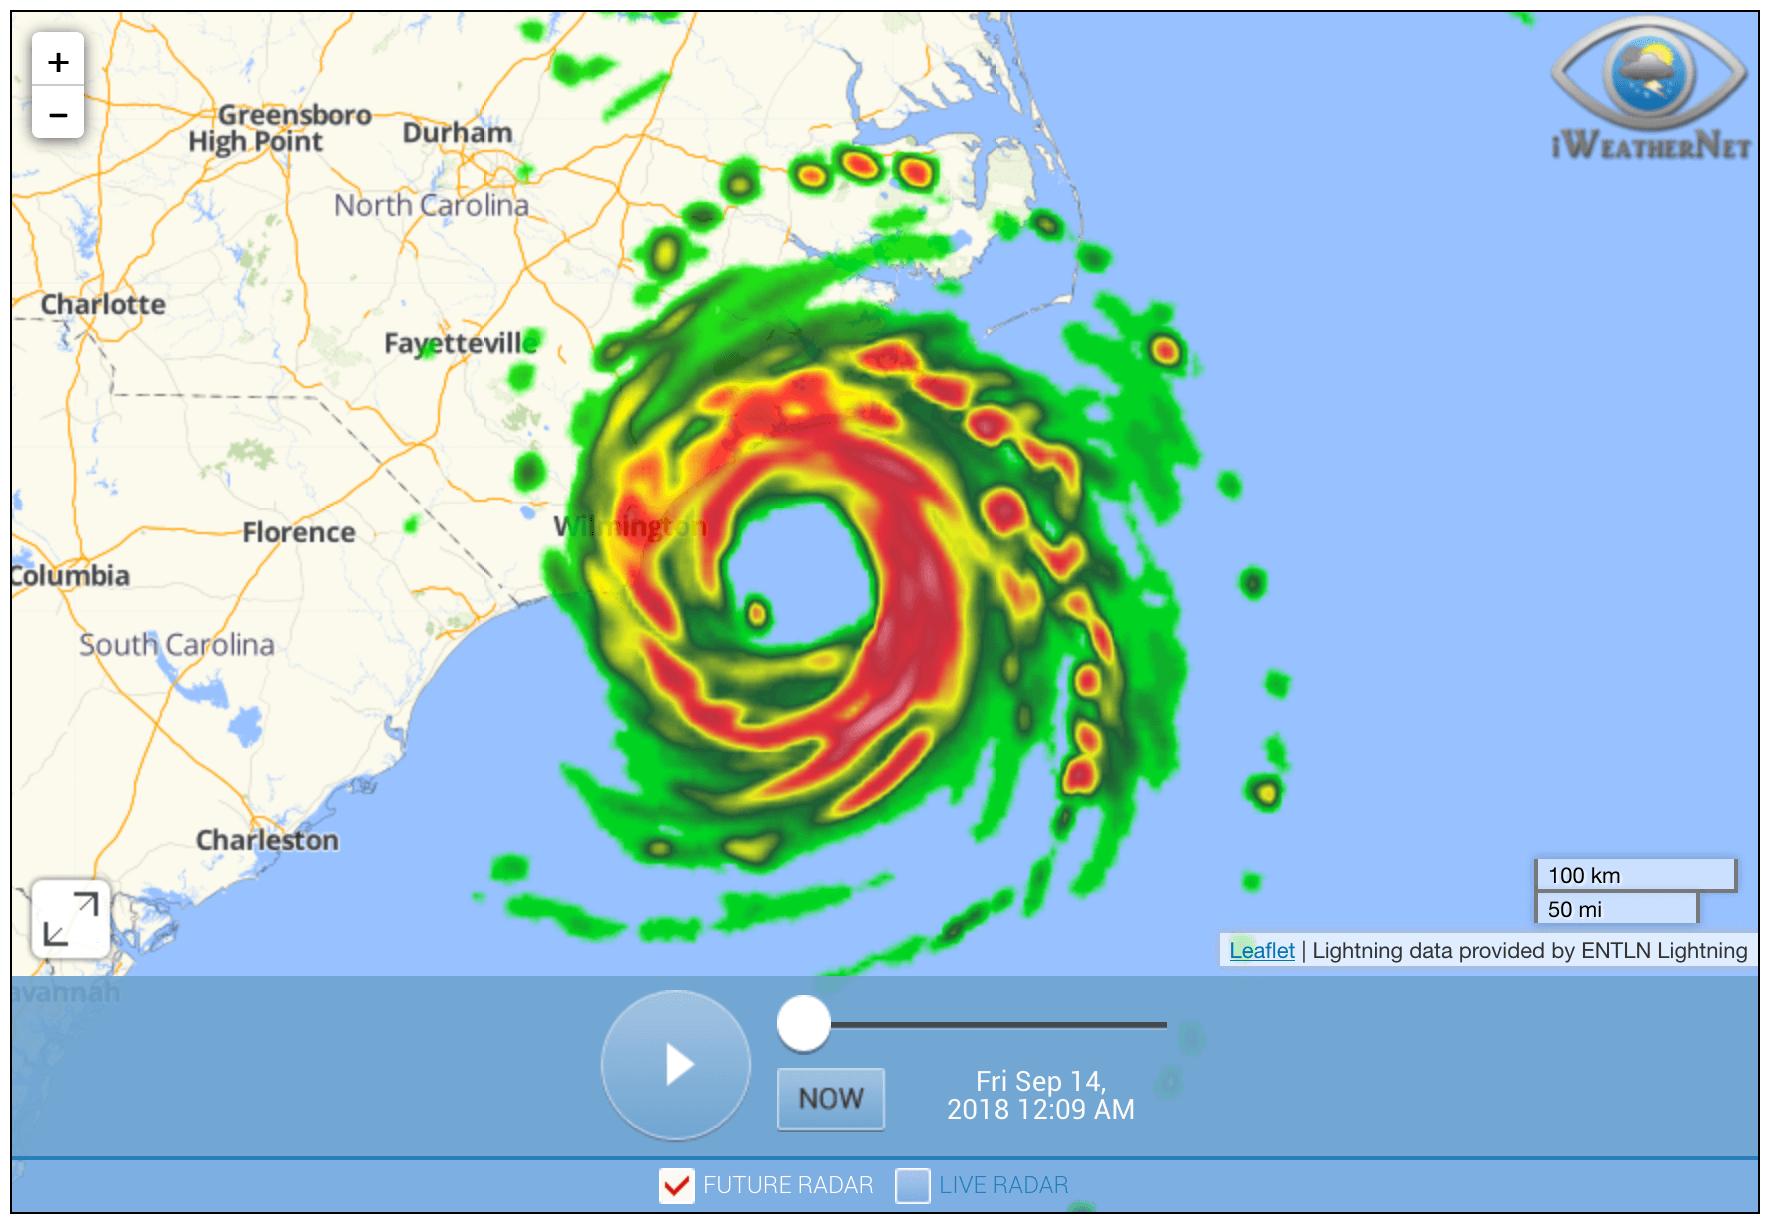 Interactive Future Radar Forecast Next 12 To 72 Hours - Texas Satellite Weather Map